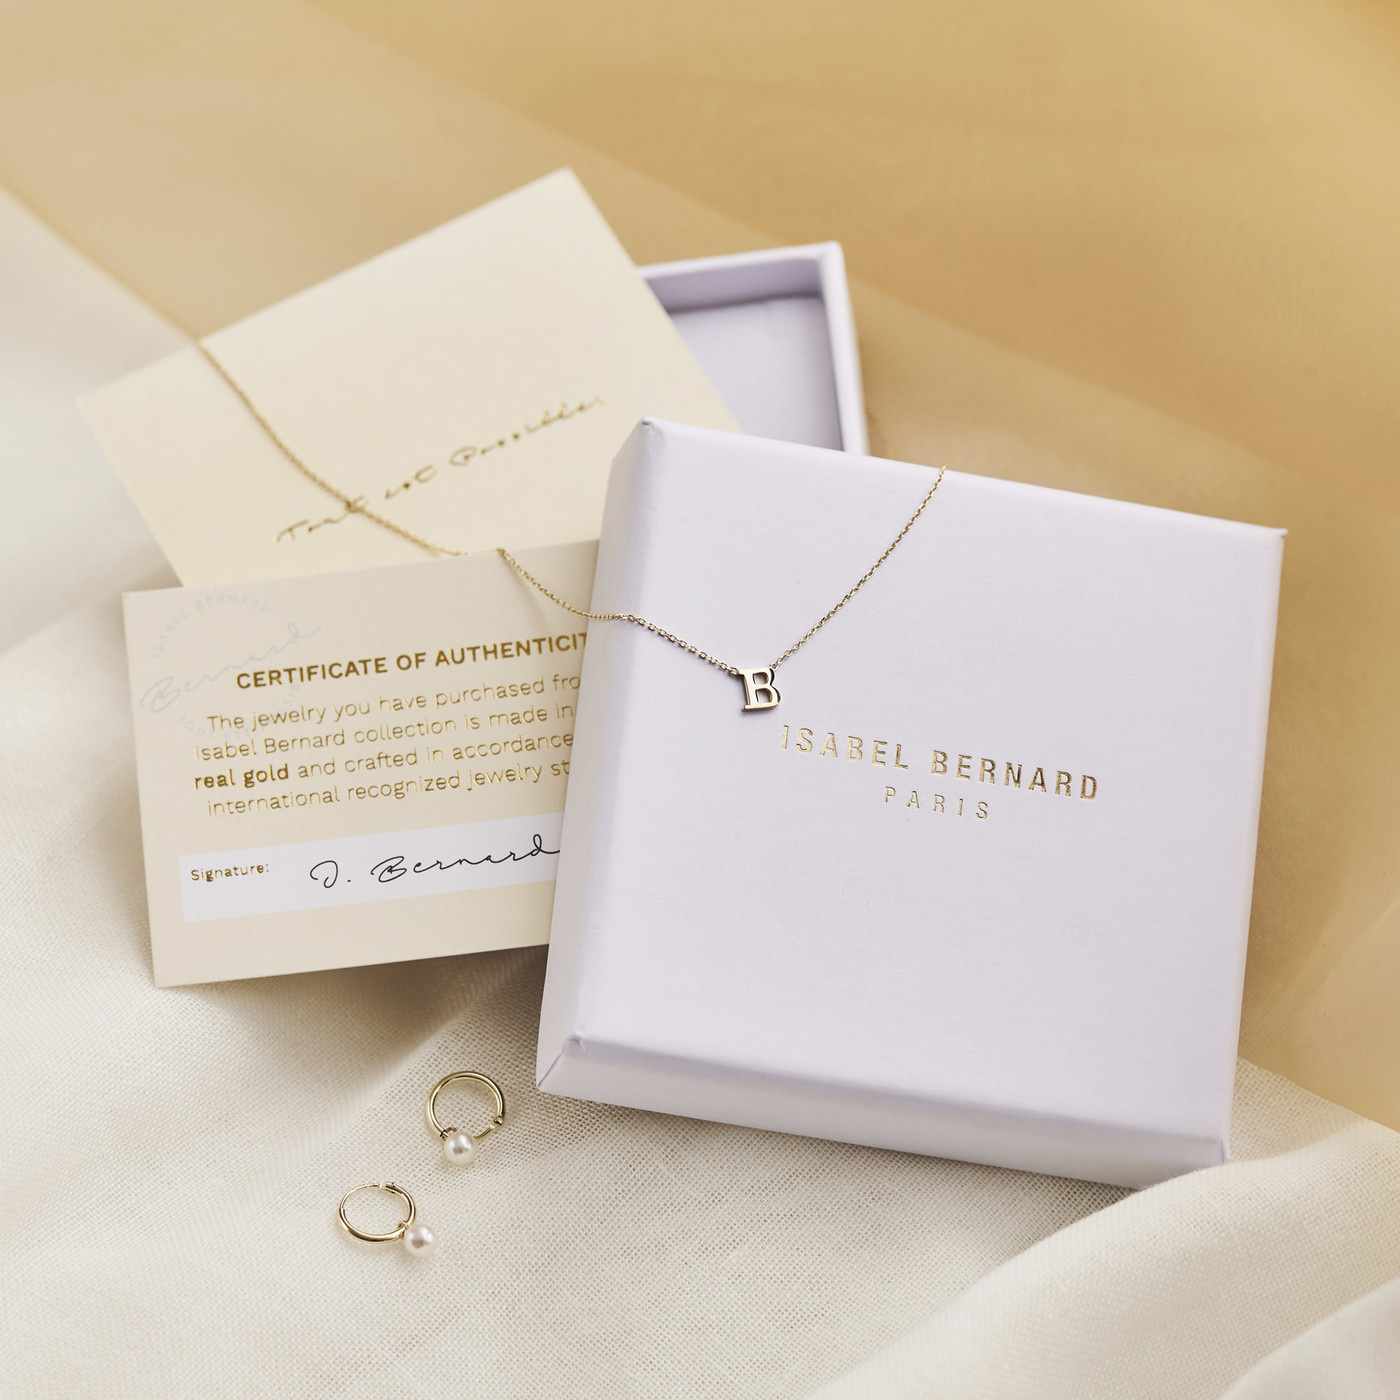 Isabel Bernard Saint Germain Loulou 14 karat white gold necklace with circles